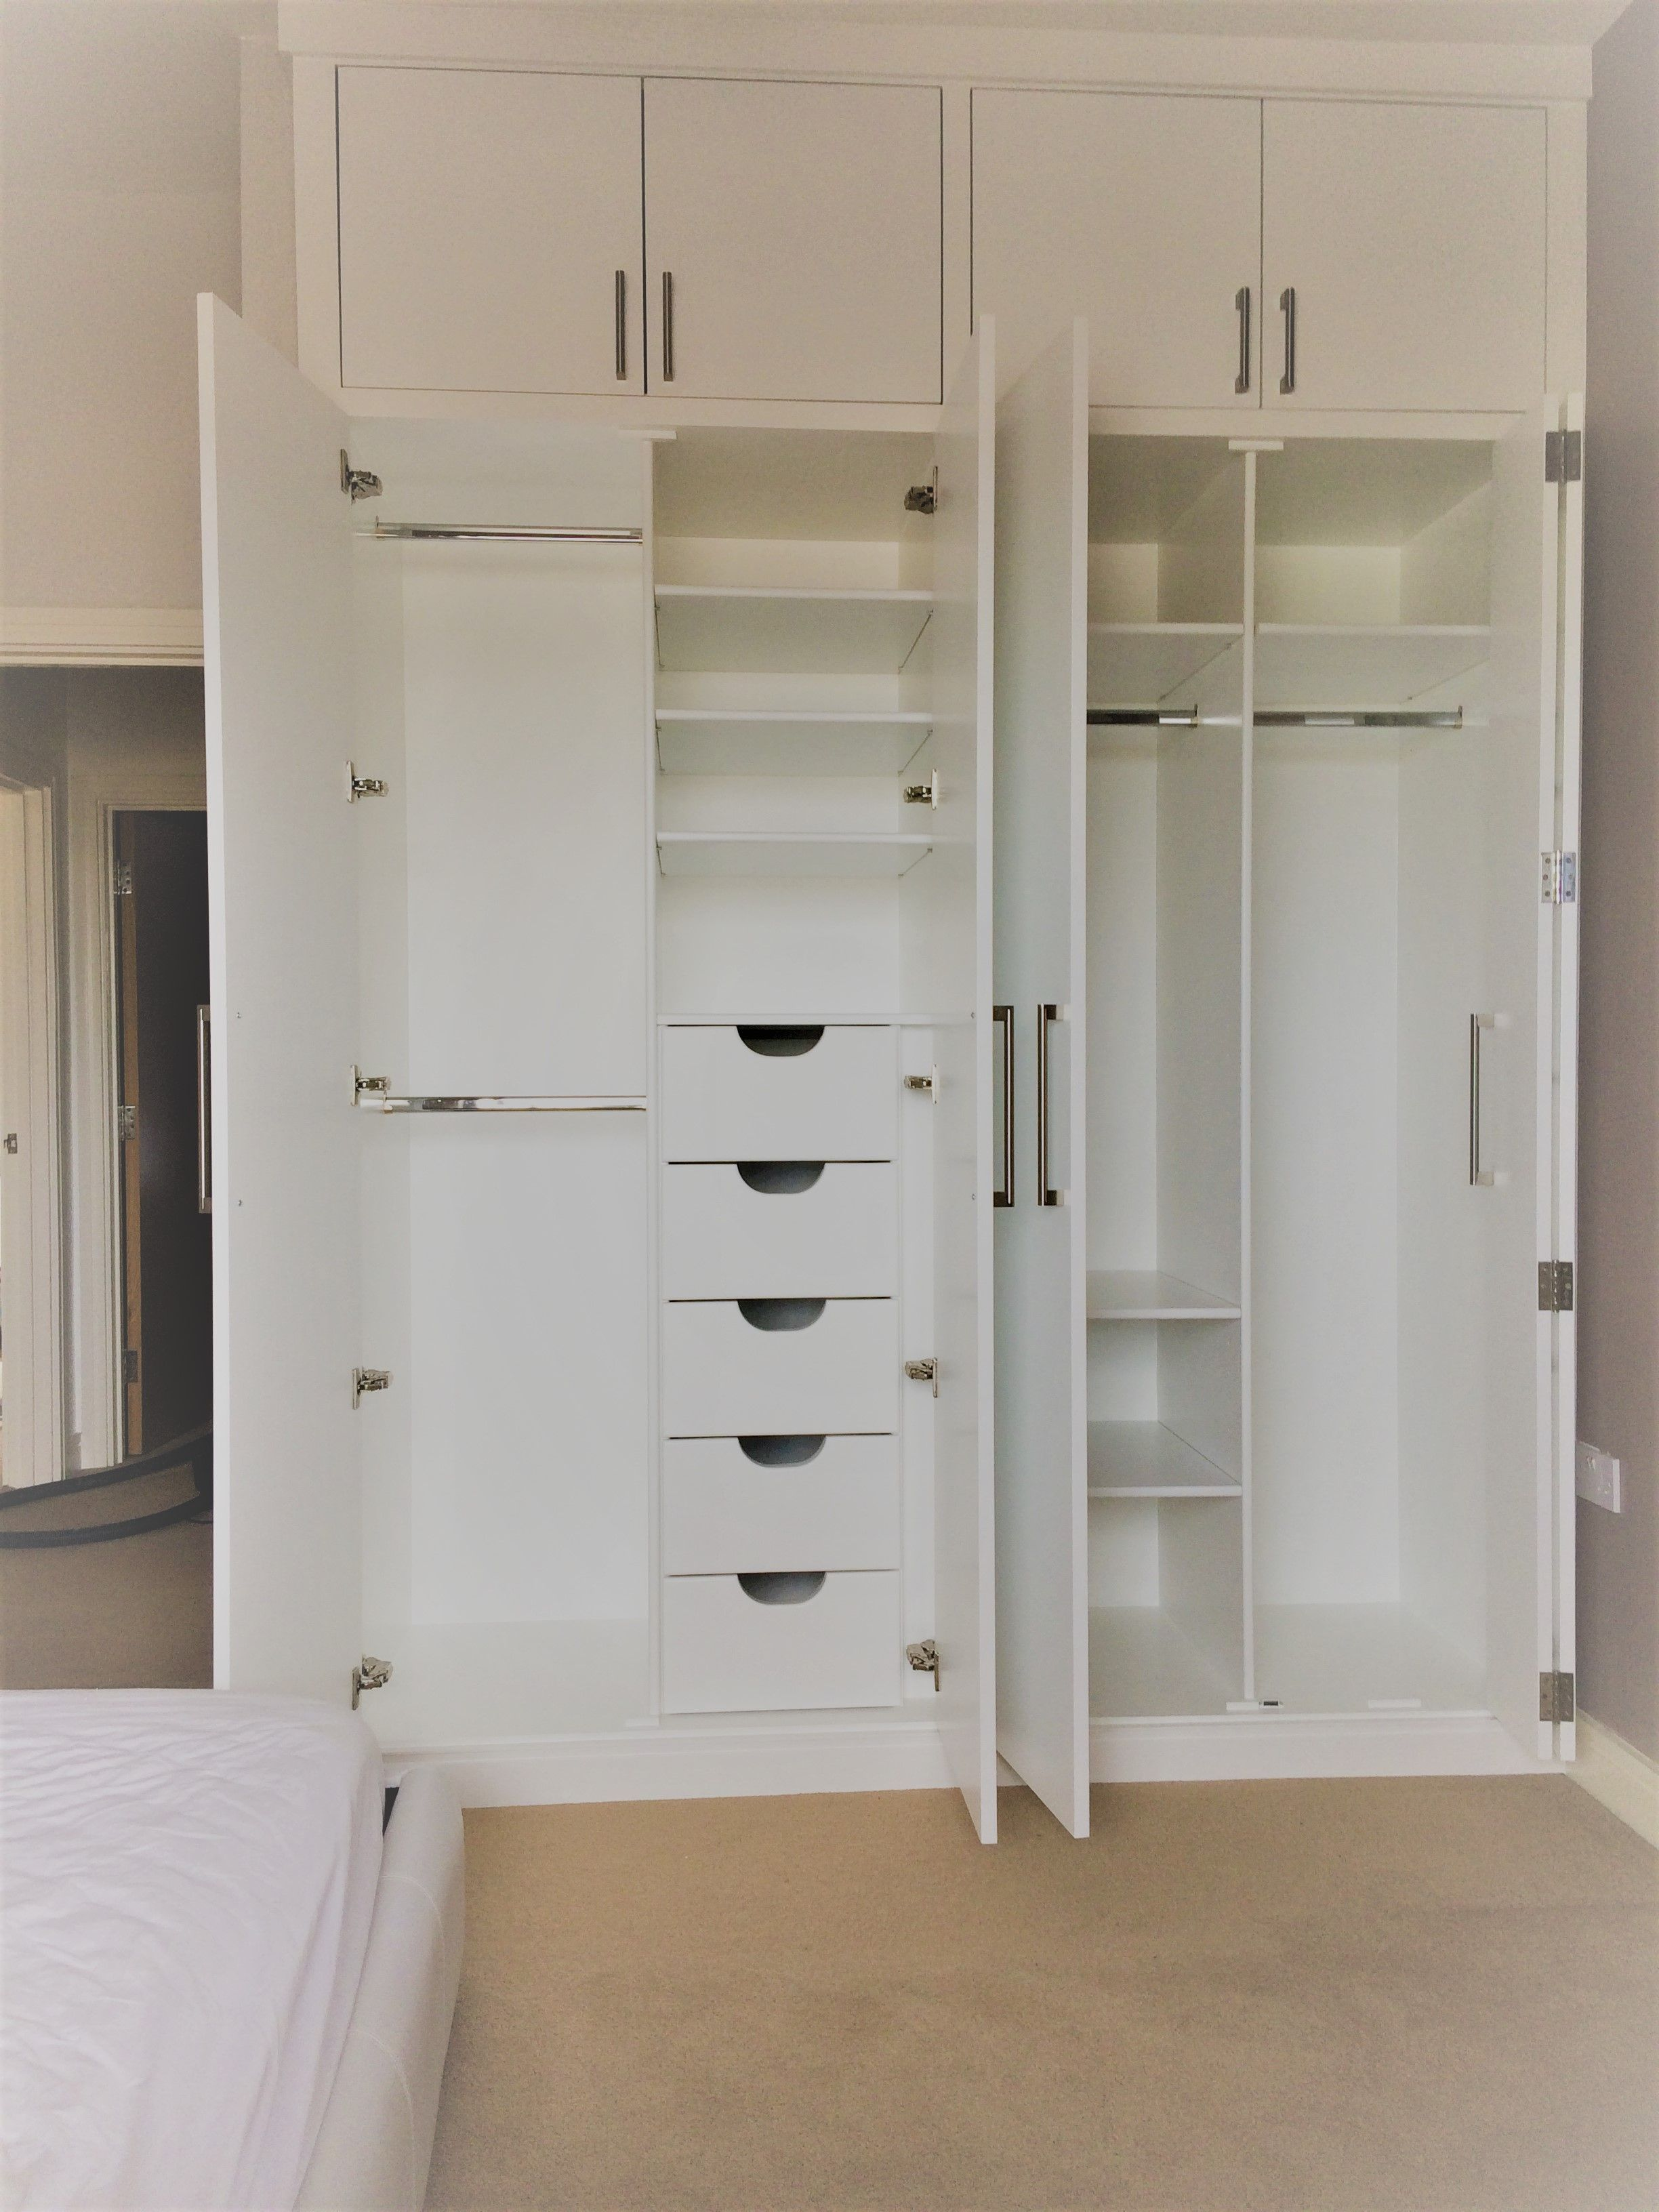 A bespoke floor to ceiling wardrobe | Bedroom cupboards ...